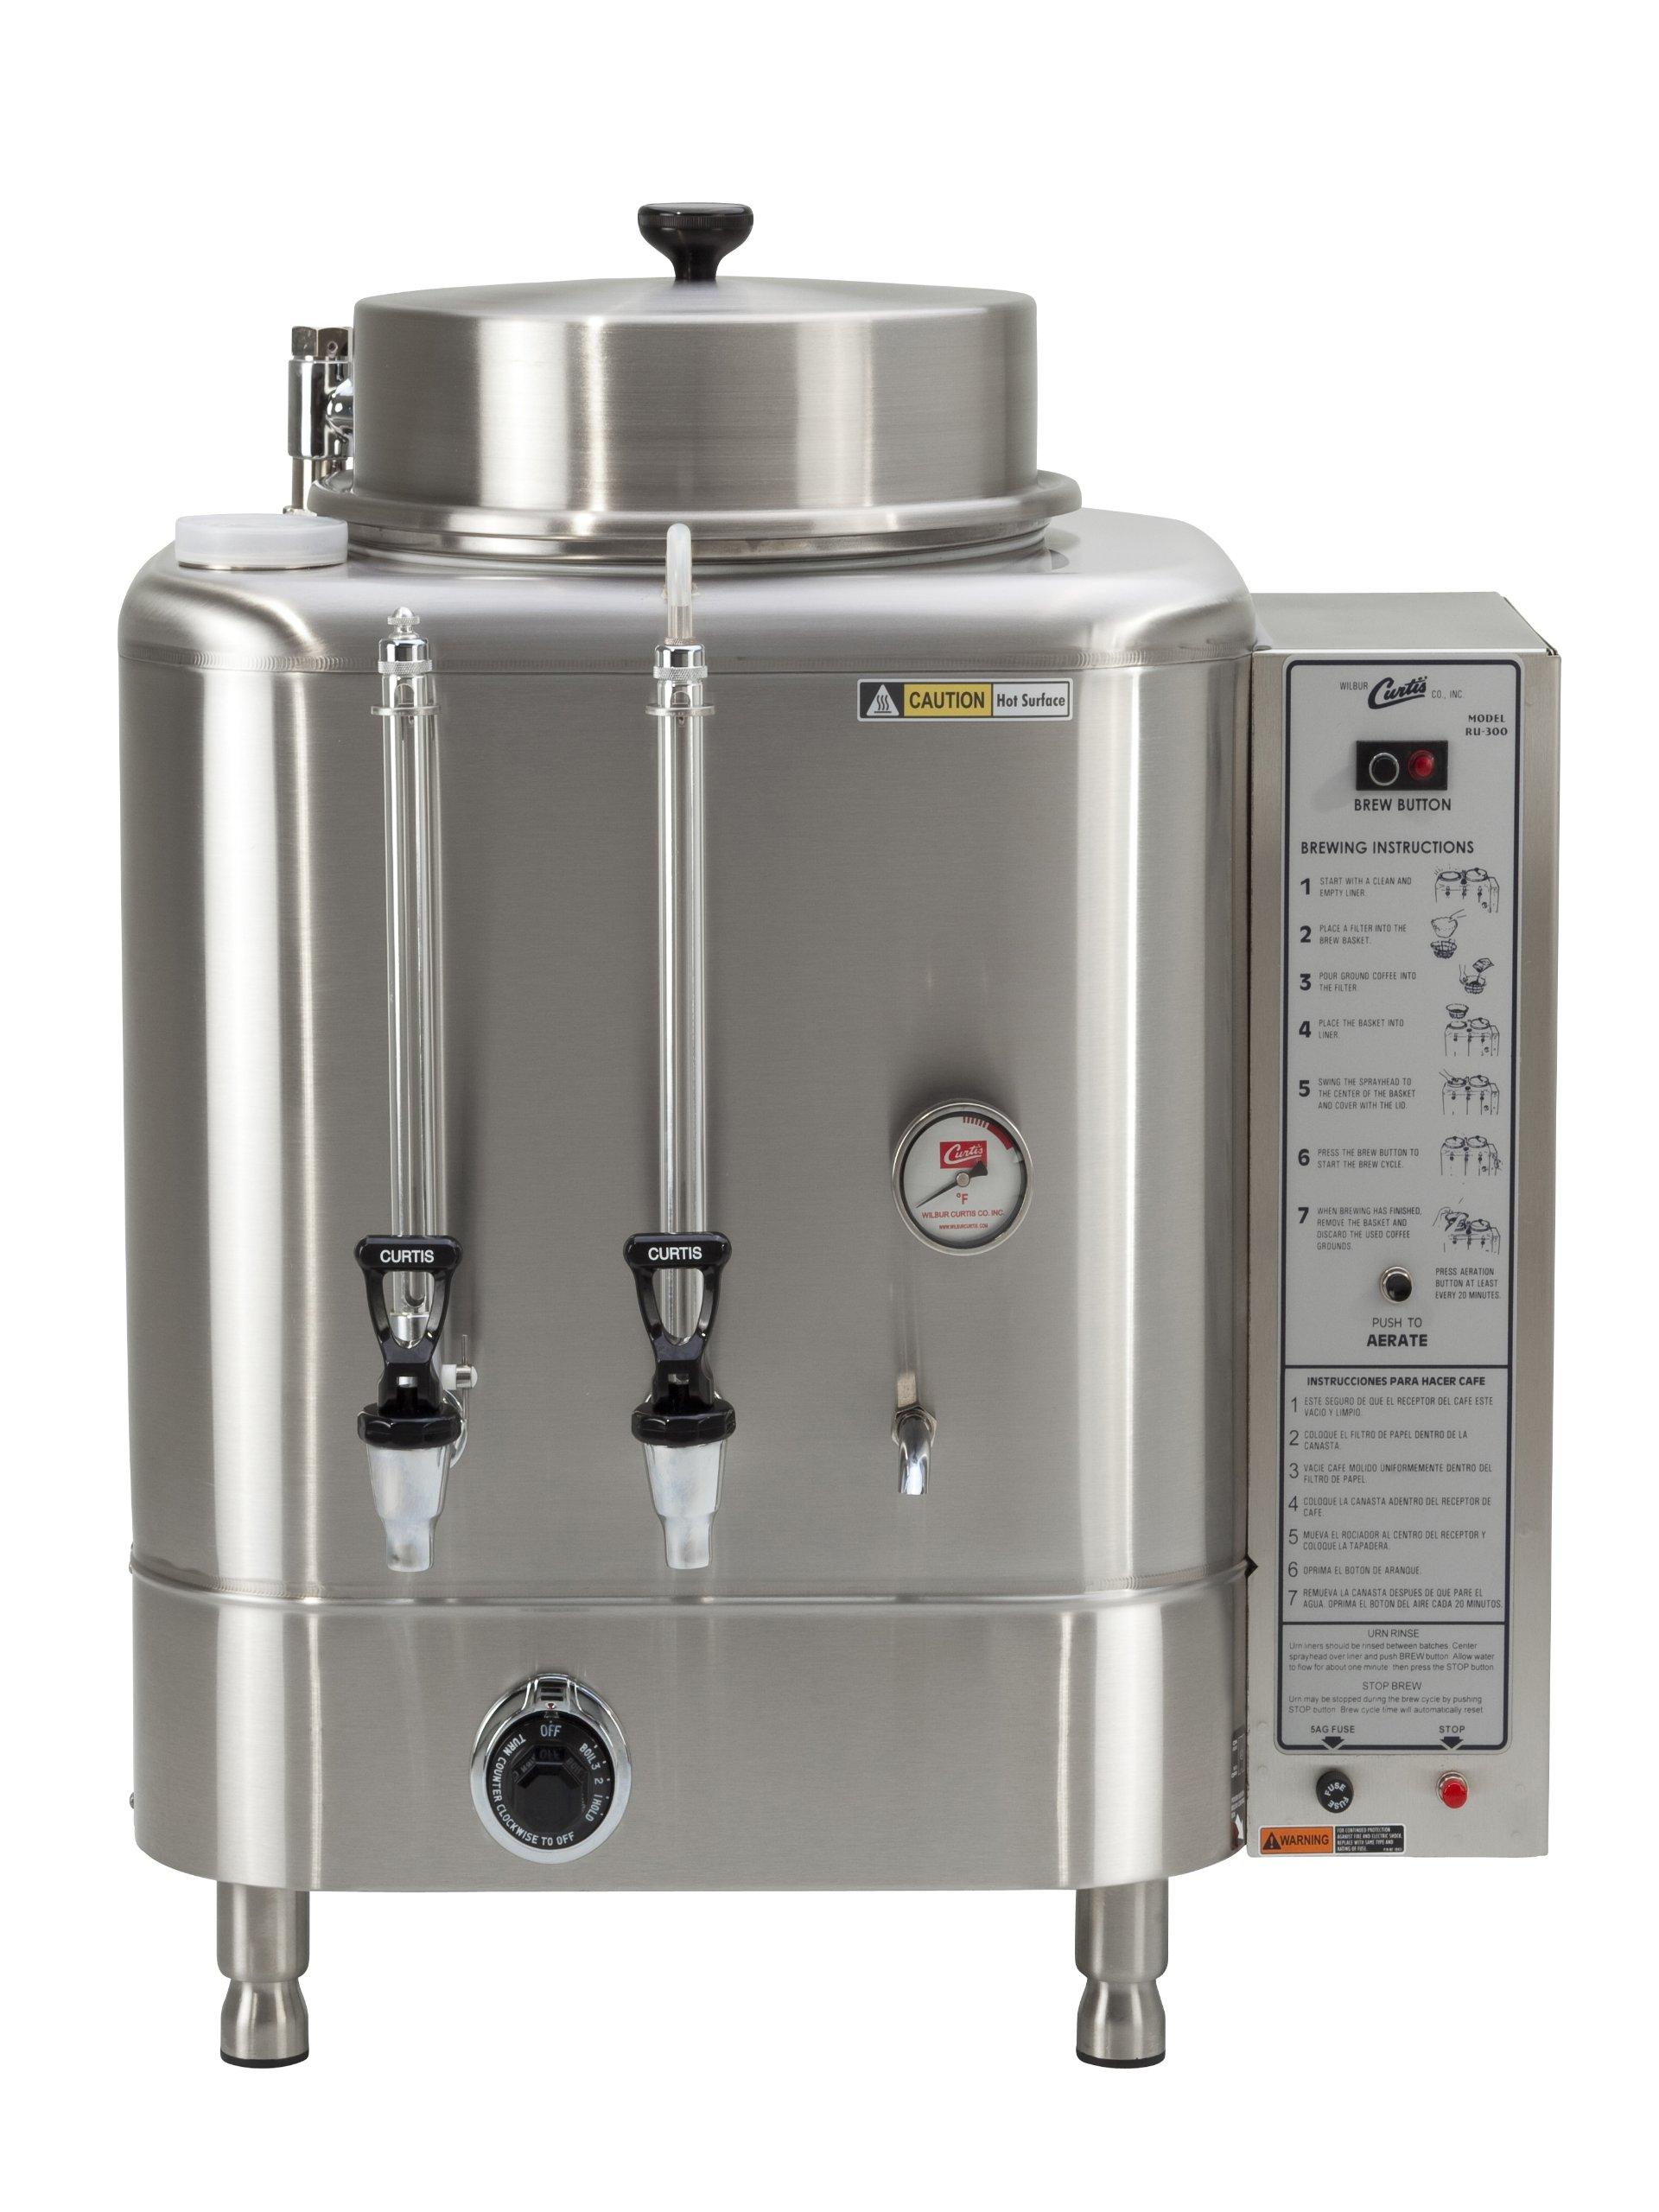 Wilbur Curtis Automatic Coffee Urn 6.0 Gallon Single Coffee Brewer, 1Ph 2W+G Natural Gas 120V 3.0A - Commercial-Grade Automatic Coffee Brewer - RU-225-35 (Each)